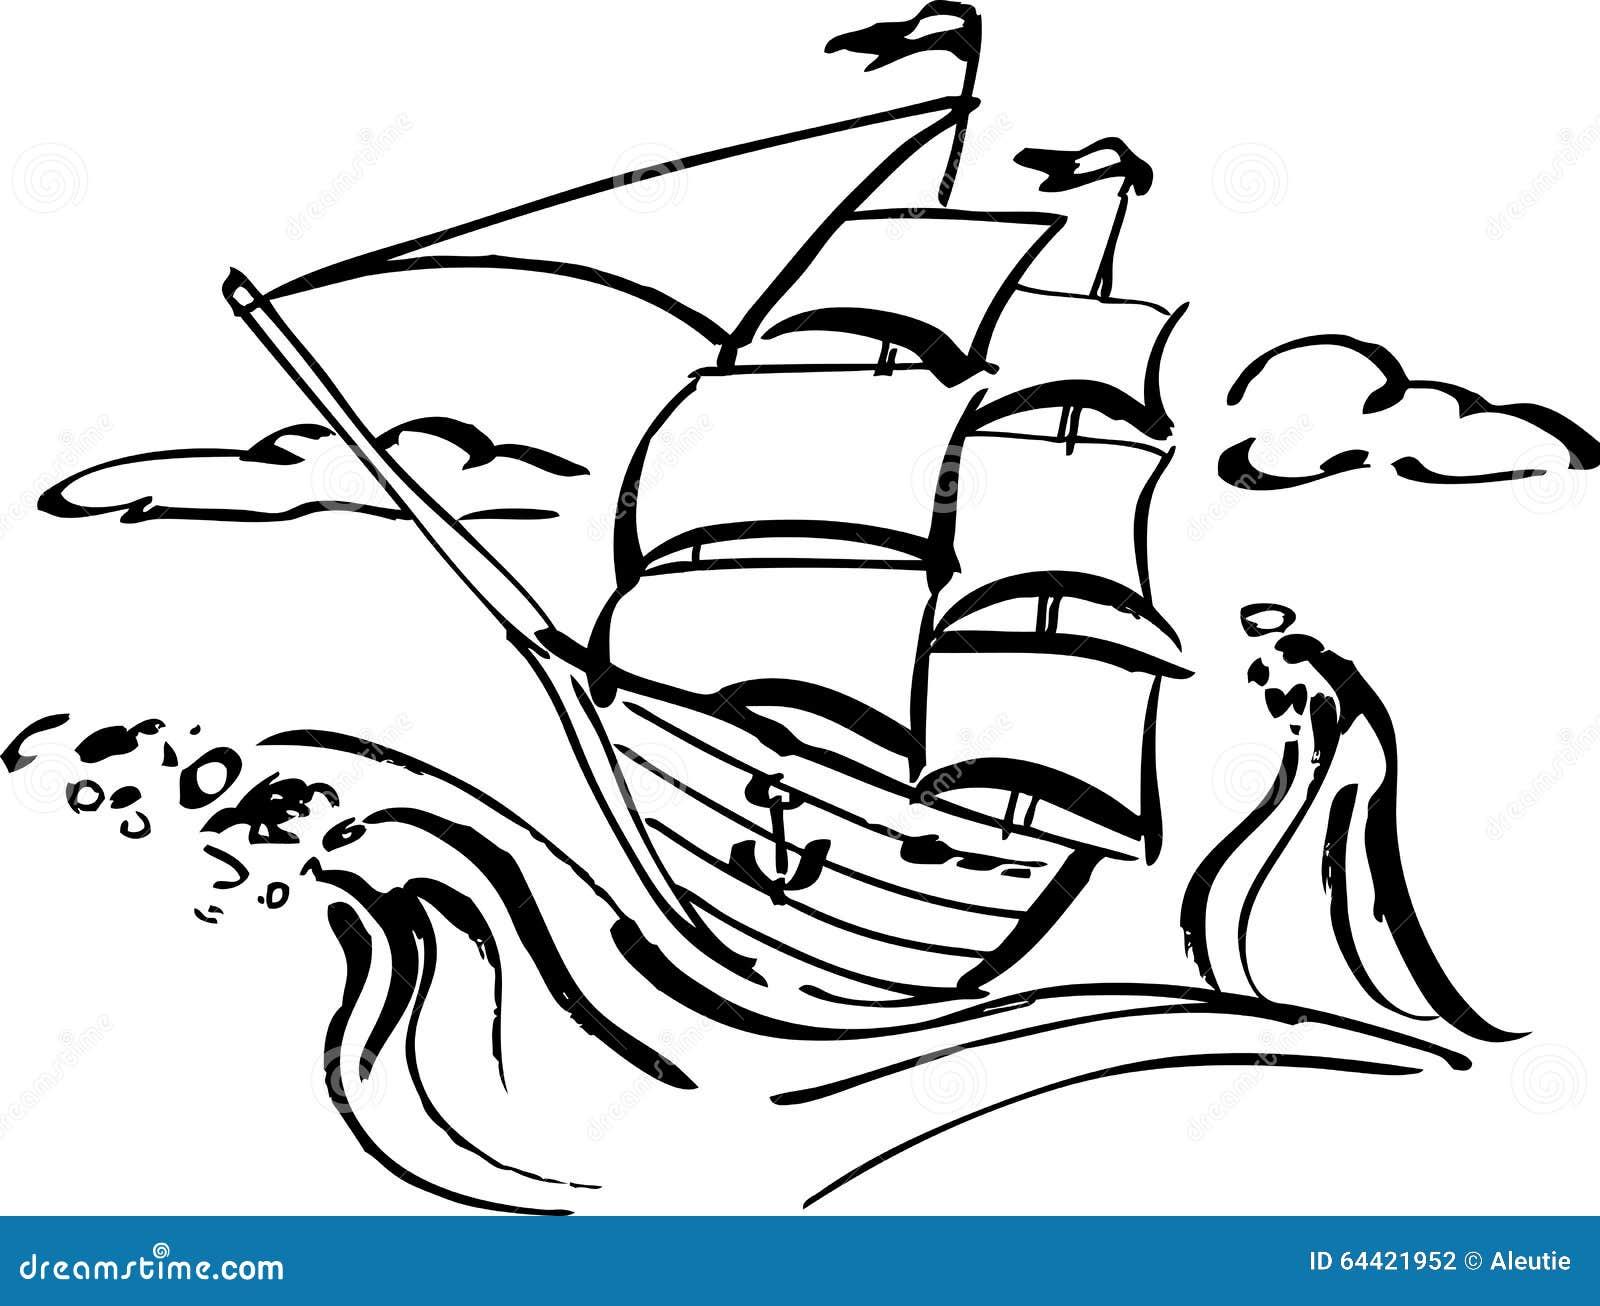 Ship Clip Art Stock Vector. Illustration Of Romantic